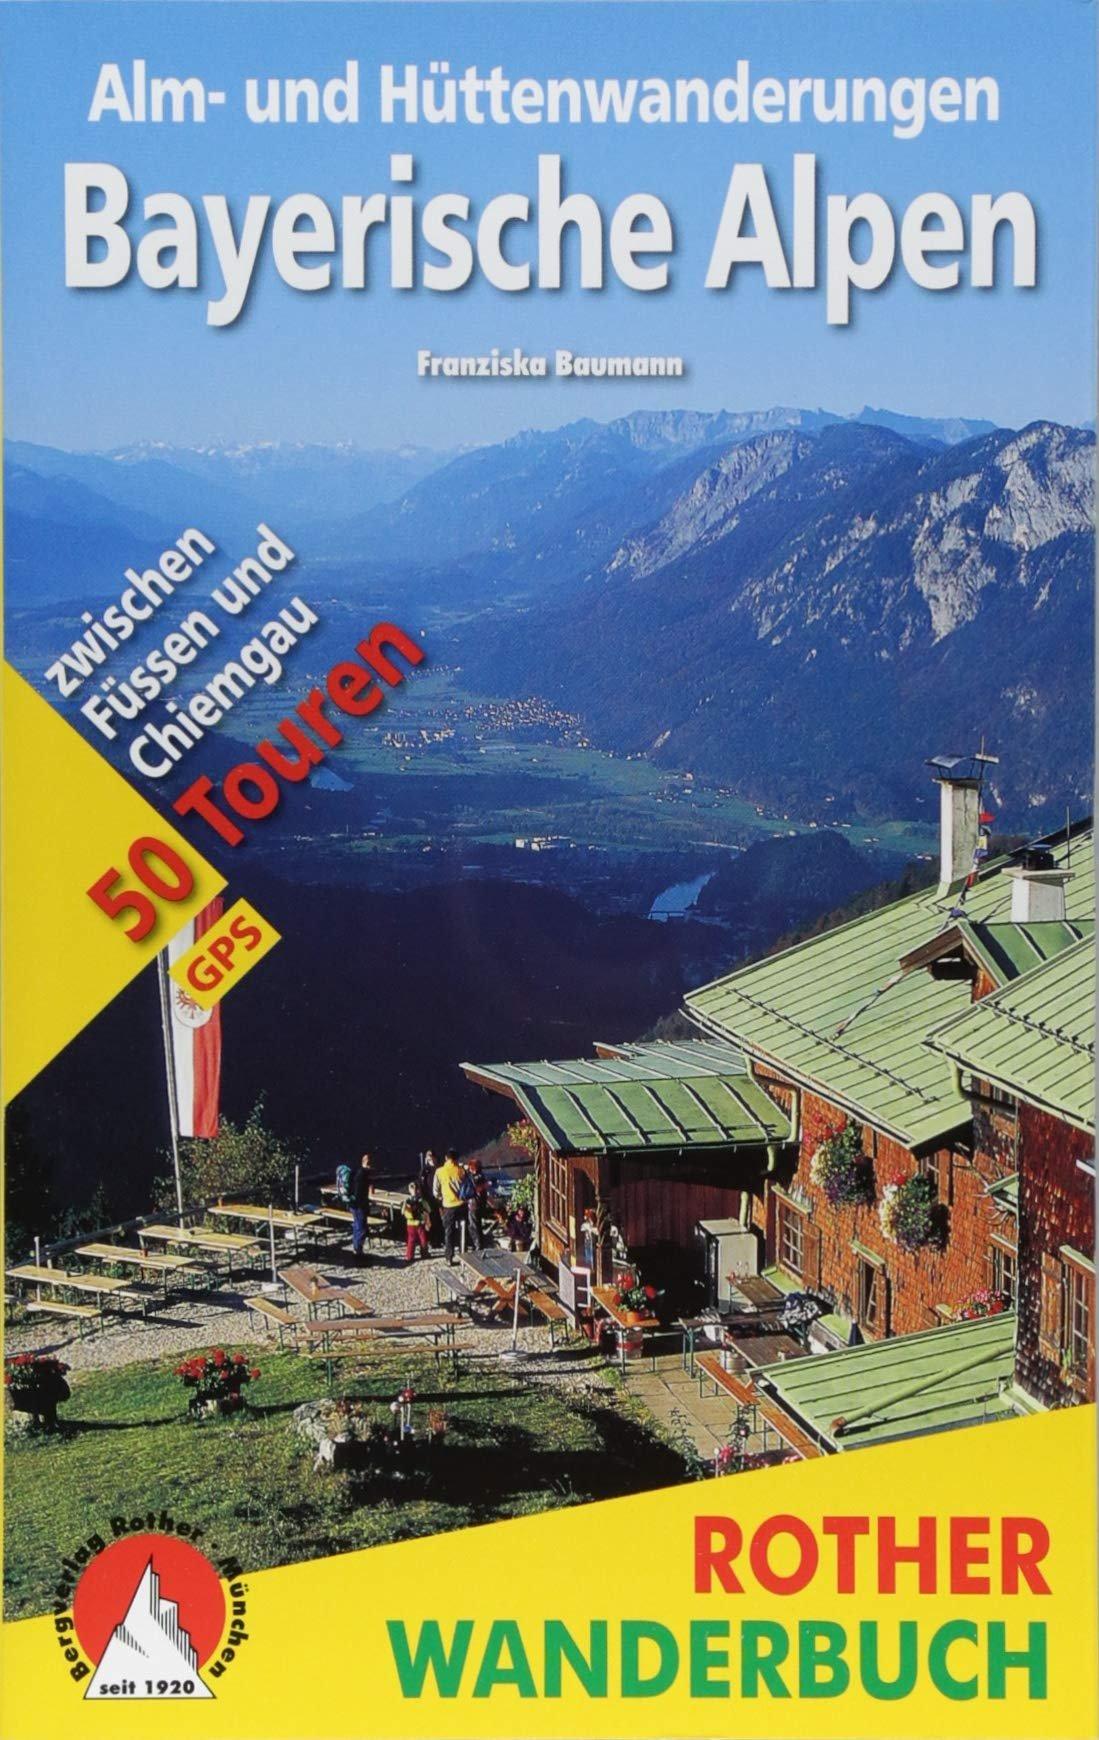 Bayerische Alpen 9783763330126  Bergverlag Rother Rother Wanderbuch  Wandelgidsen Beierse Alpen en München